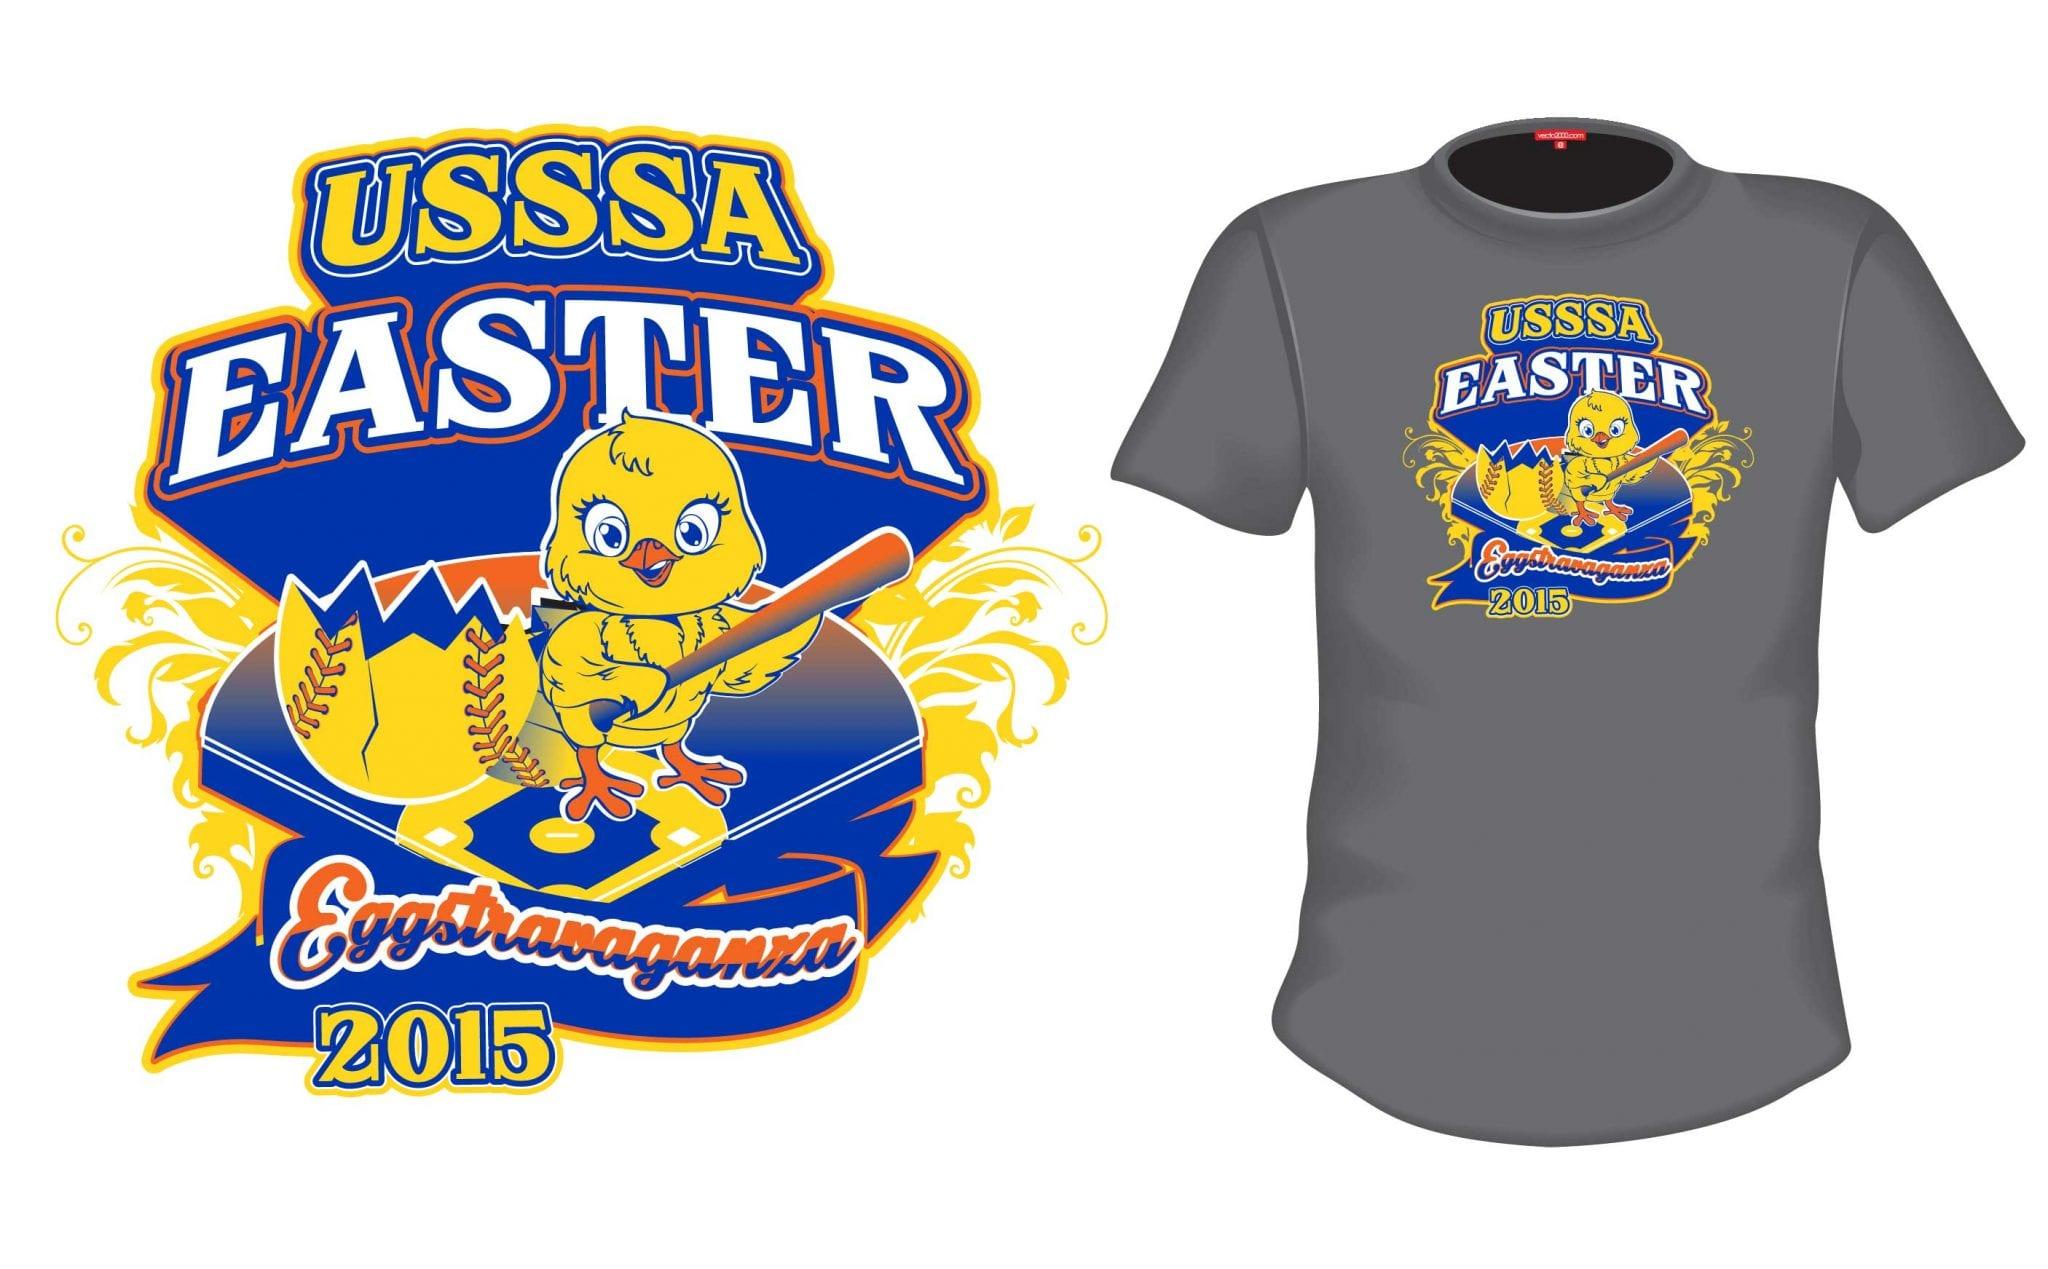 2015 Easter Extravaganza cool softball tshirt logo design by urartstudio